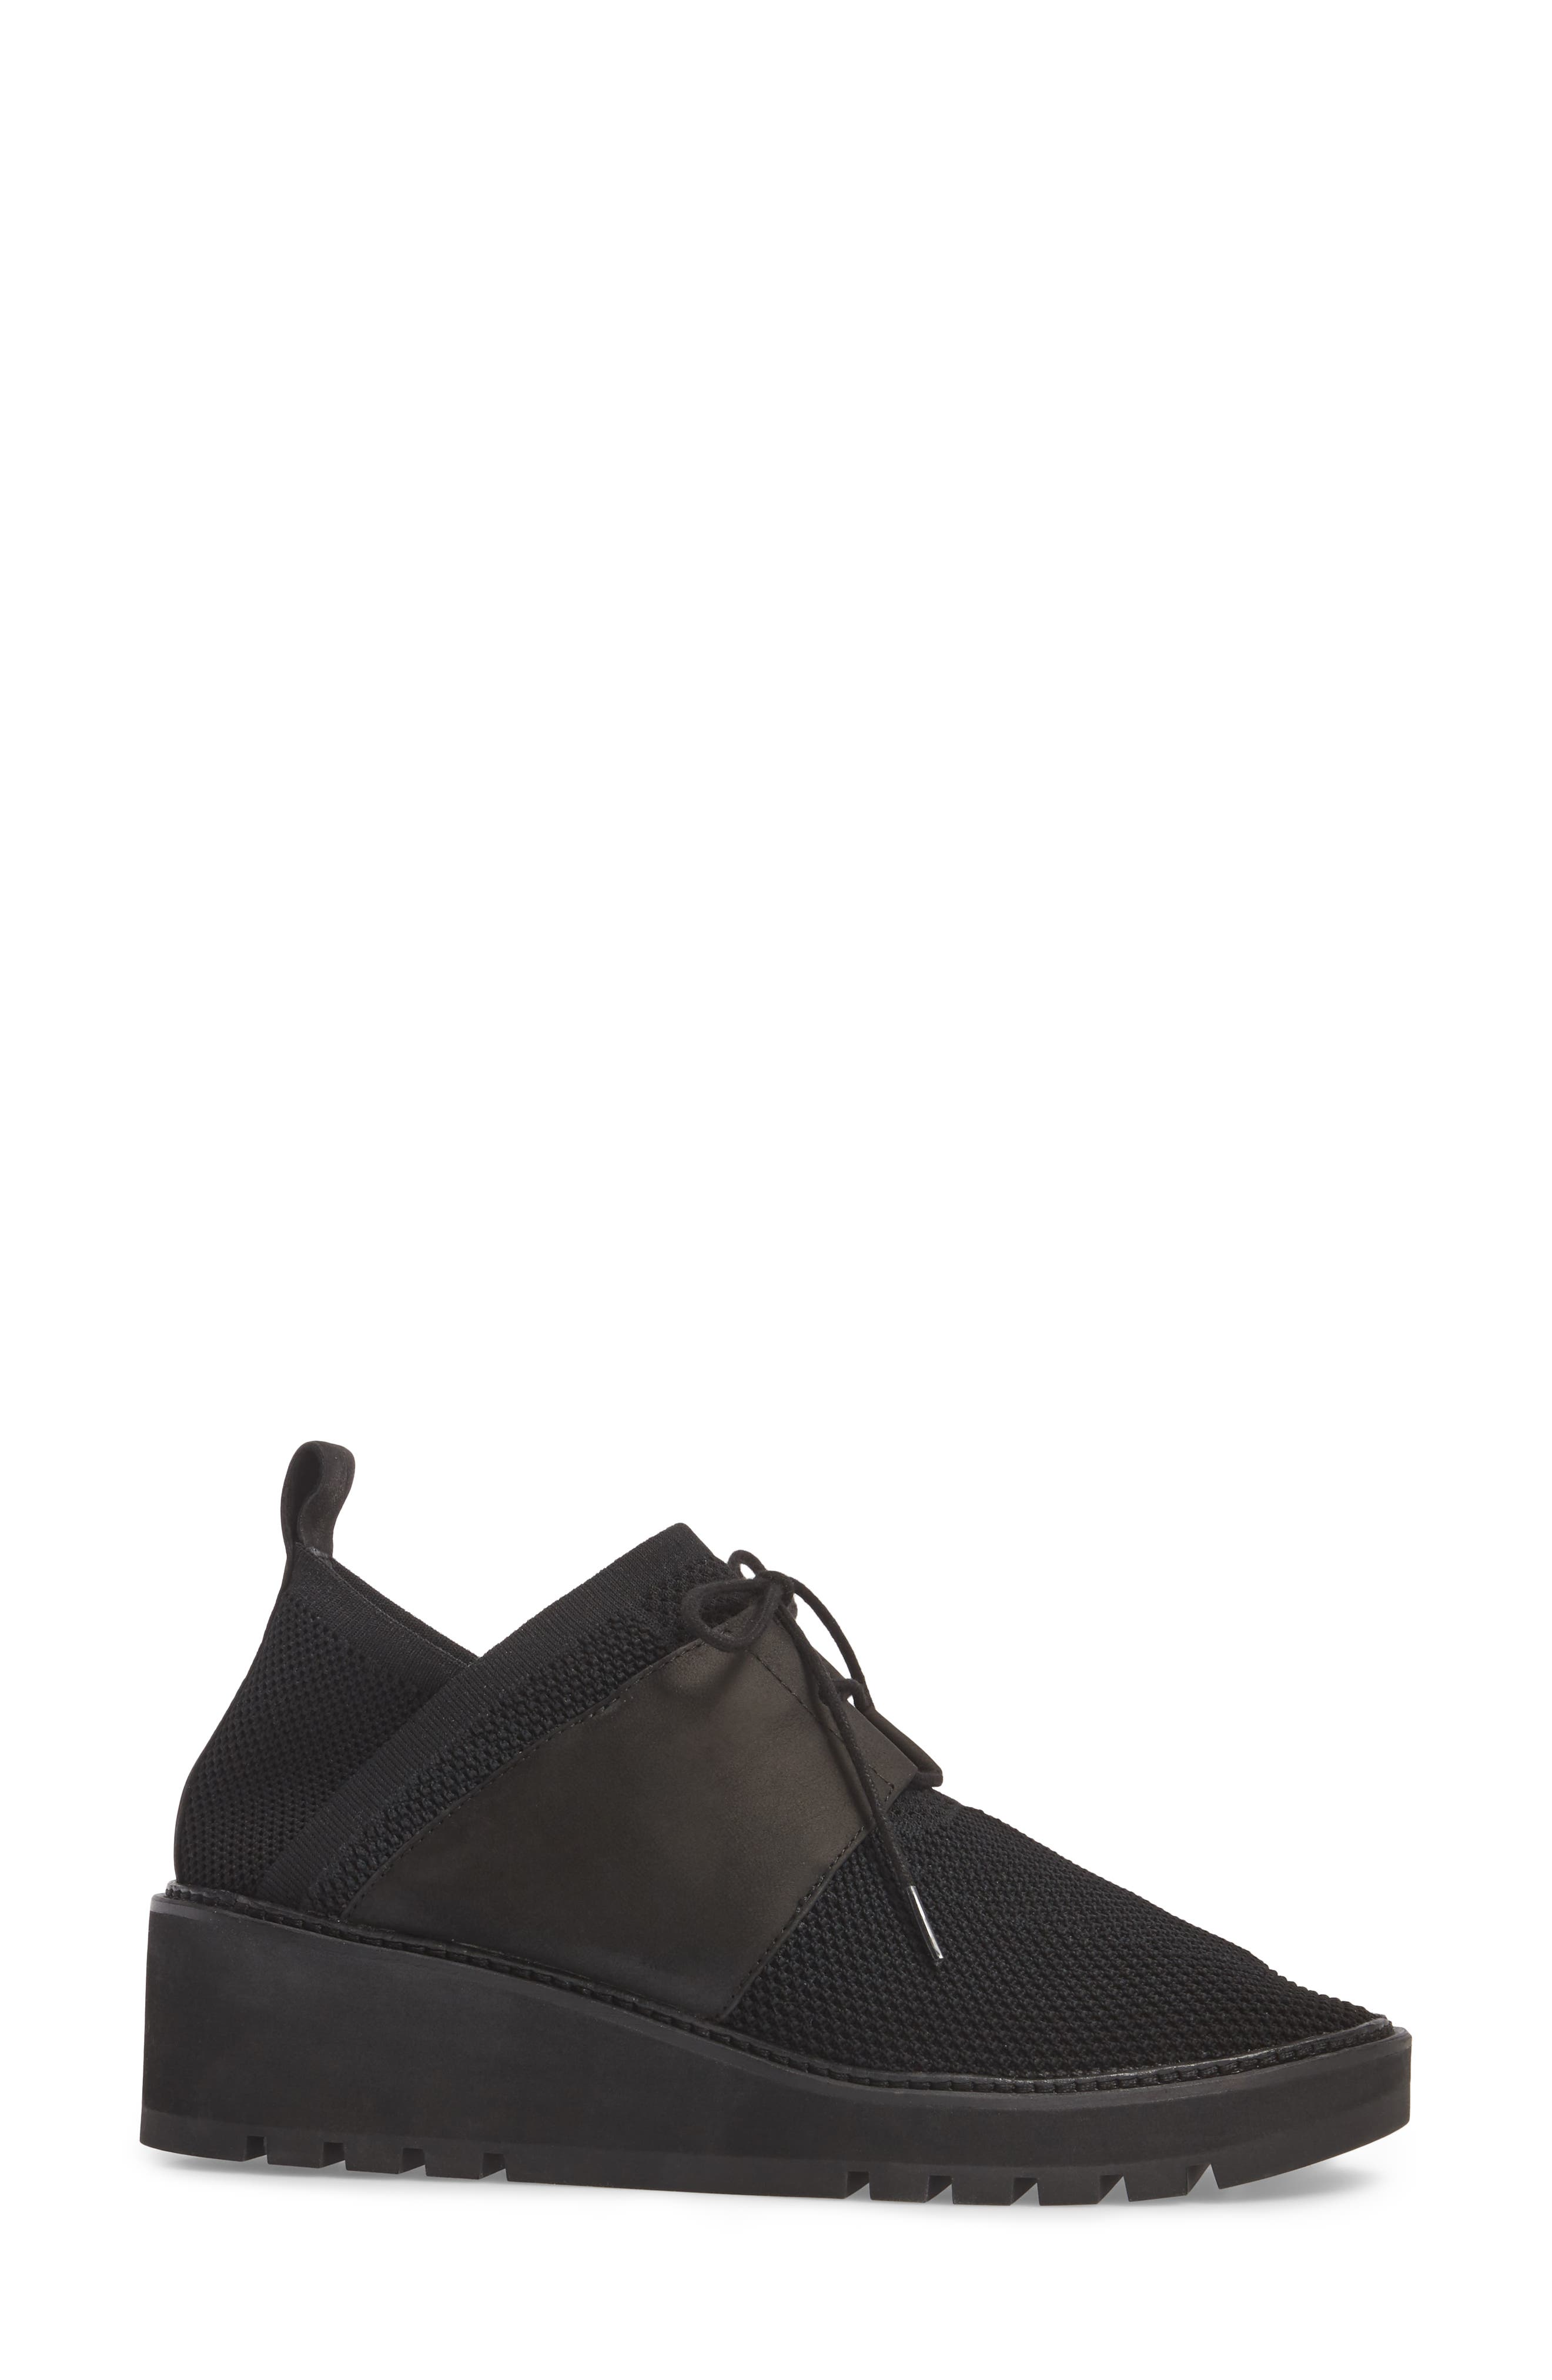 Wilson Sneaker,                             Alternate thumbnail 3, color,                             Black Fabric